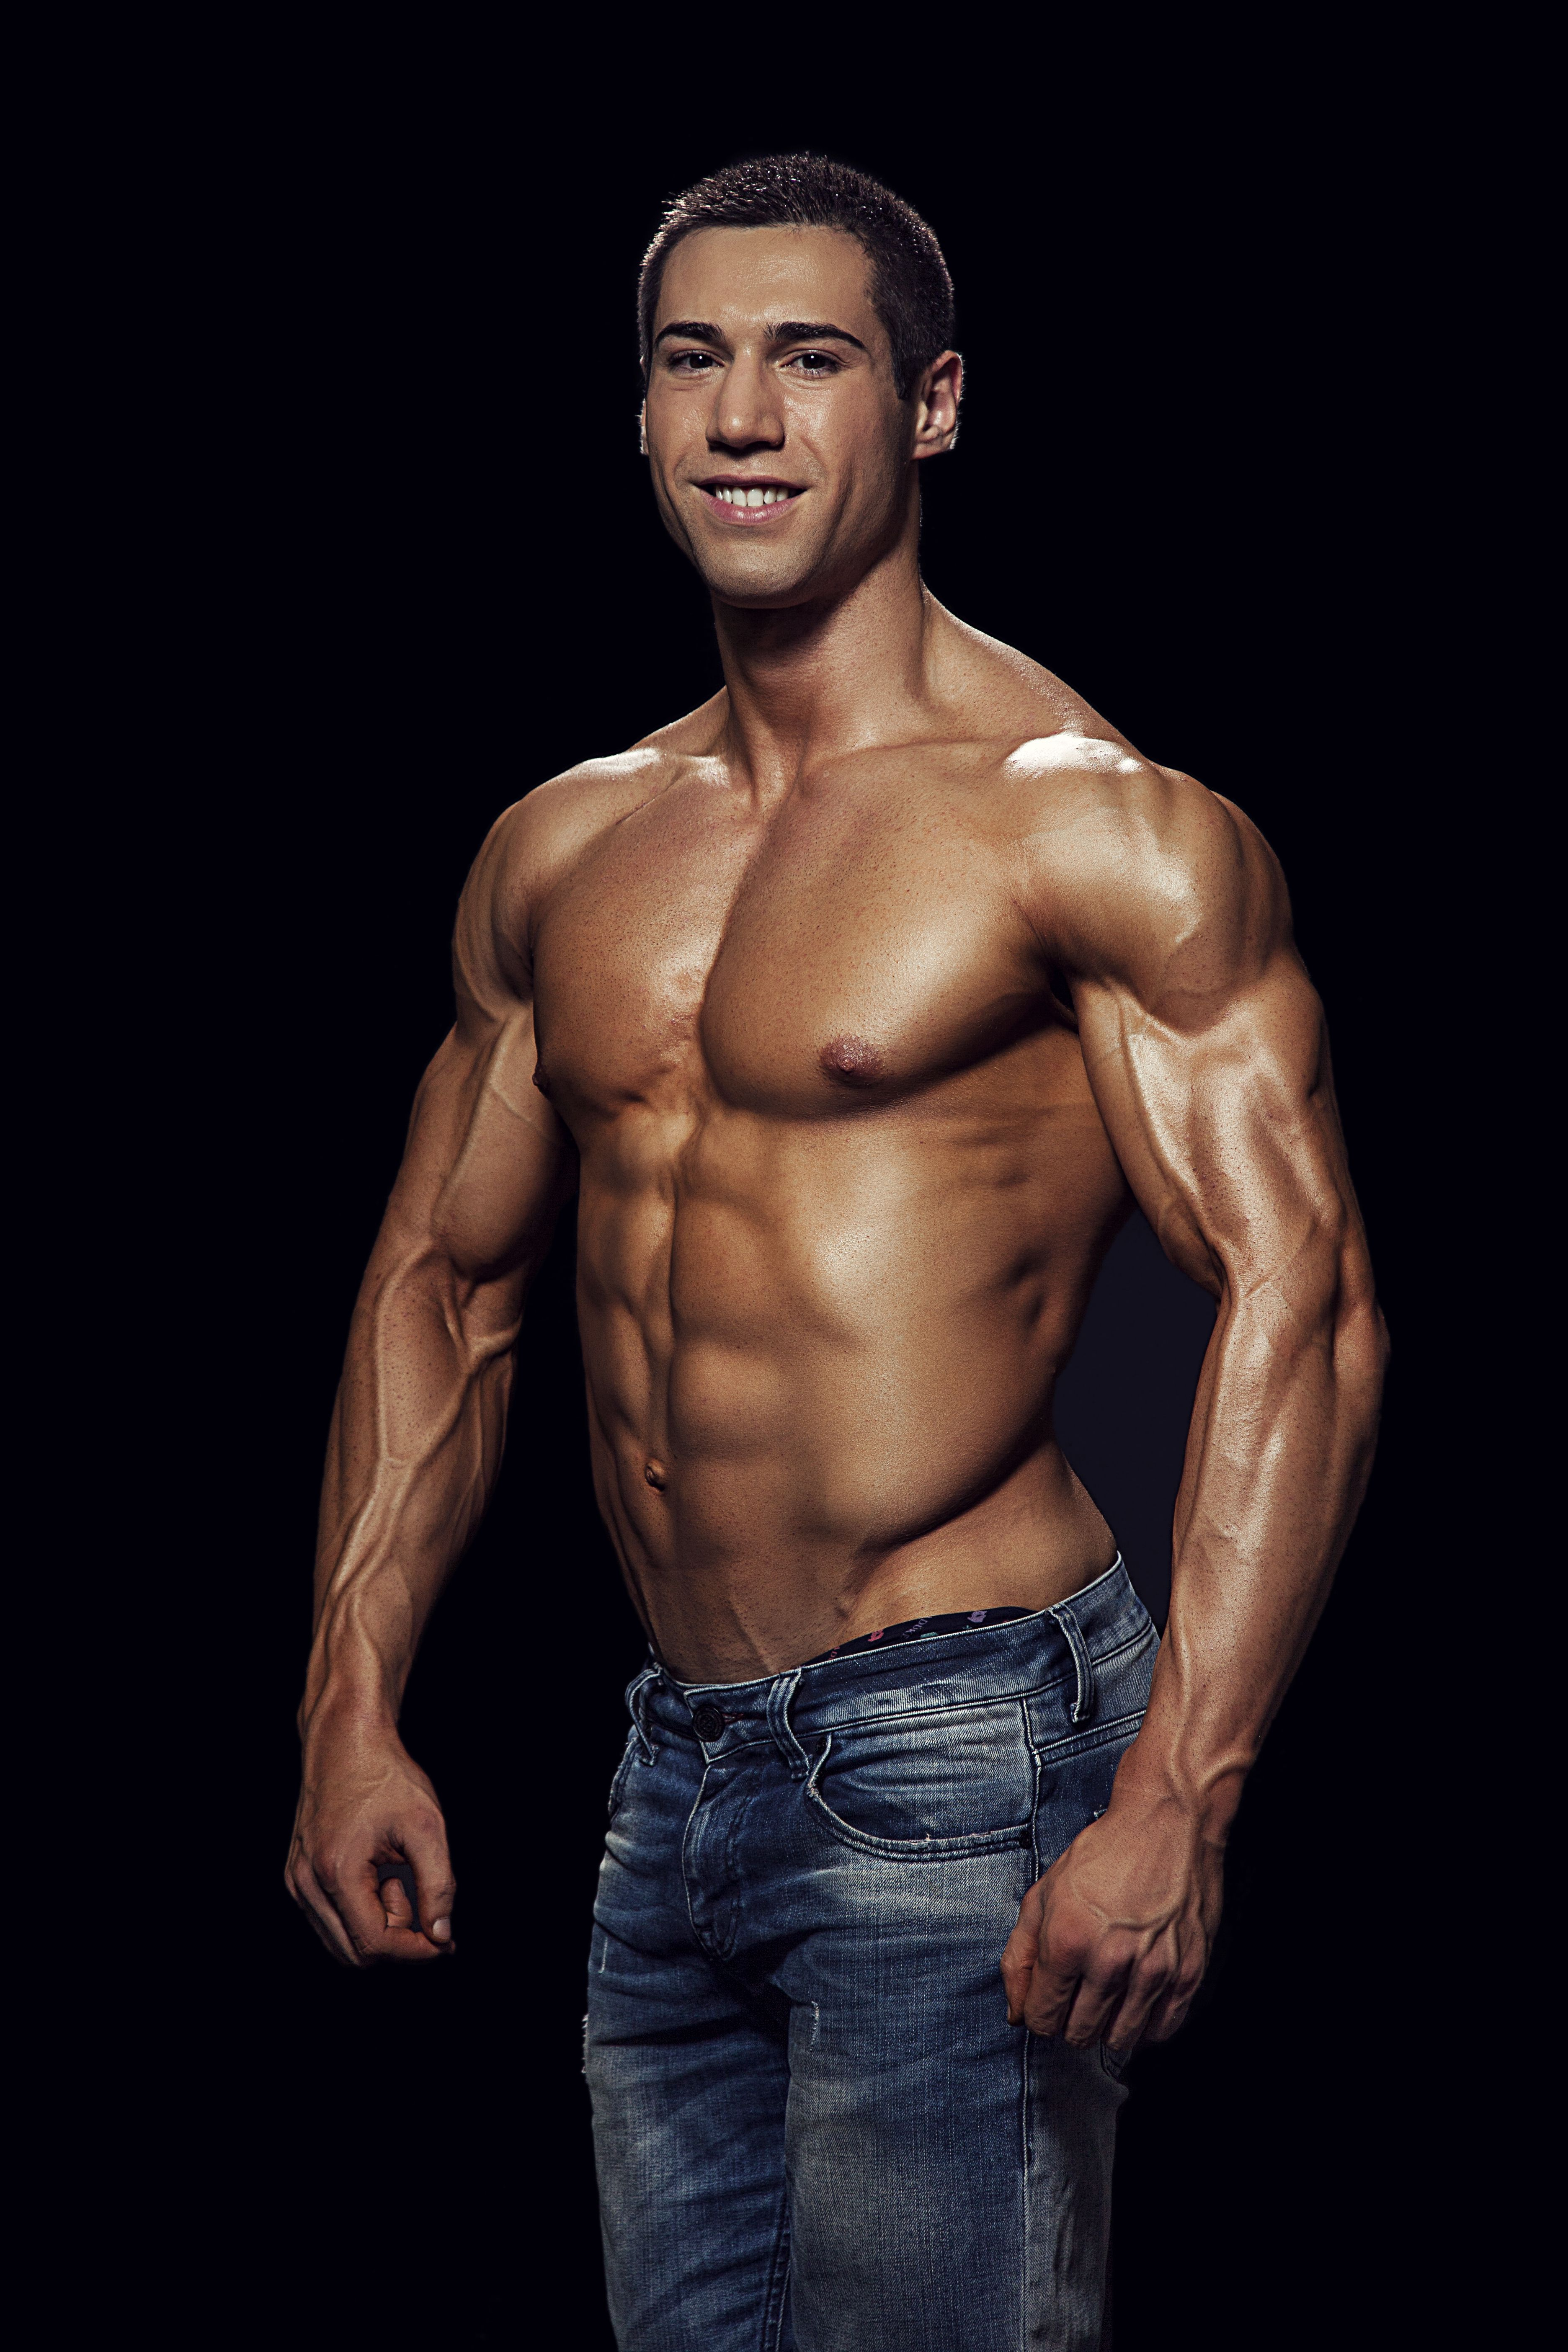 Me #fitness #gym #bodybuilding #shredded | Fitness